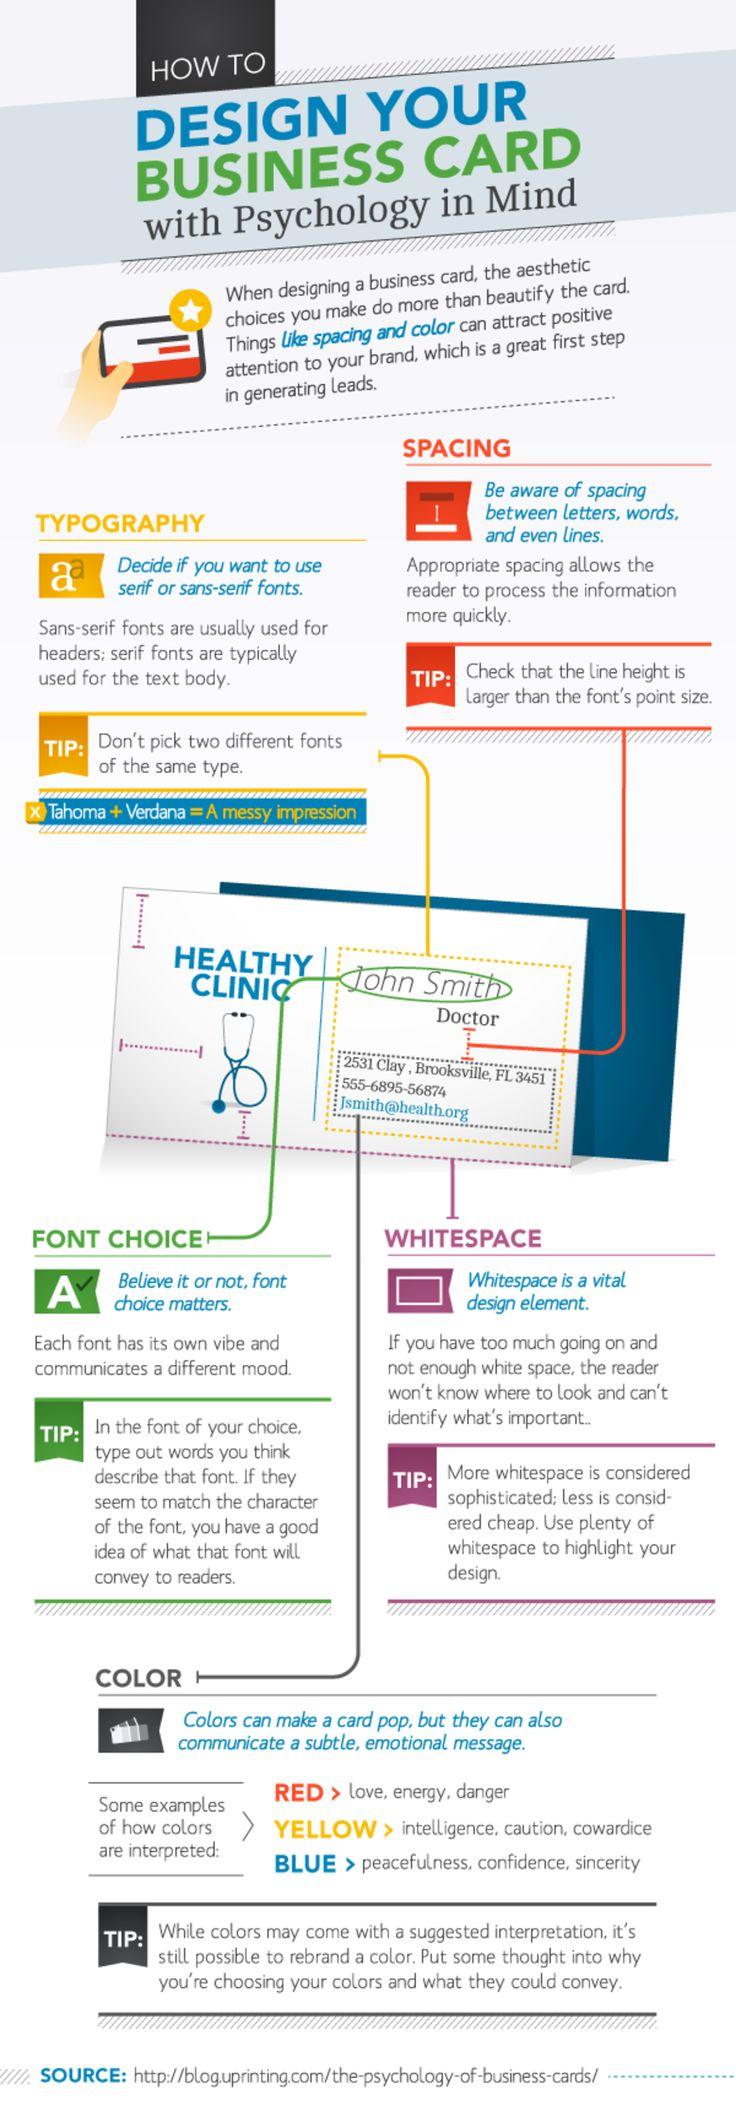 25 best ideas about Business card software on Pinterest